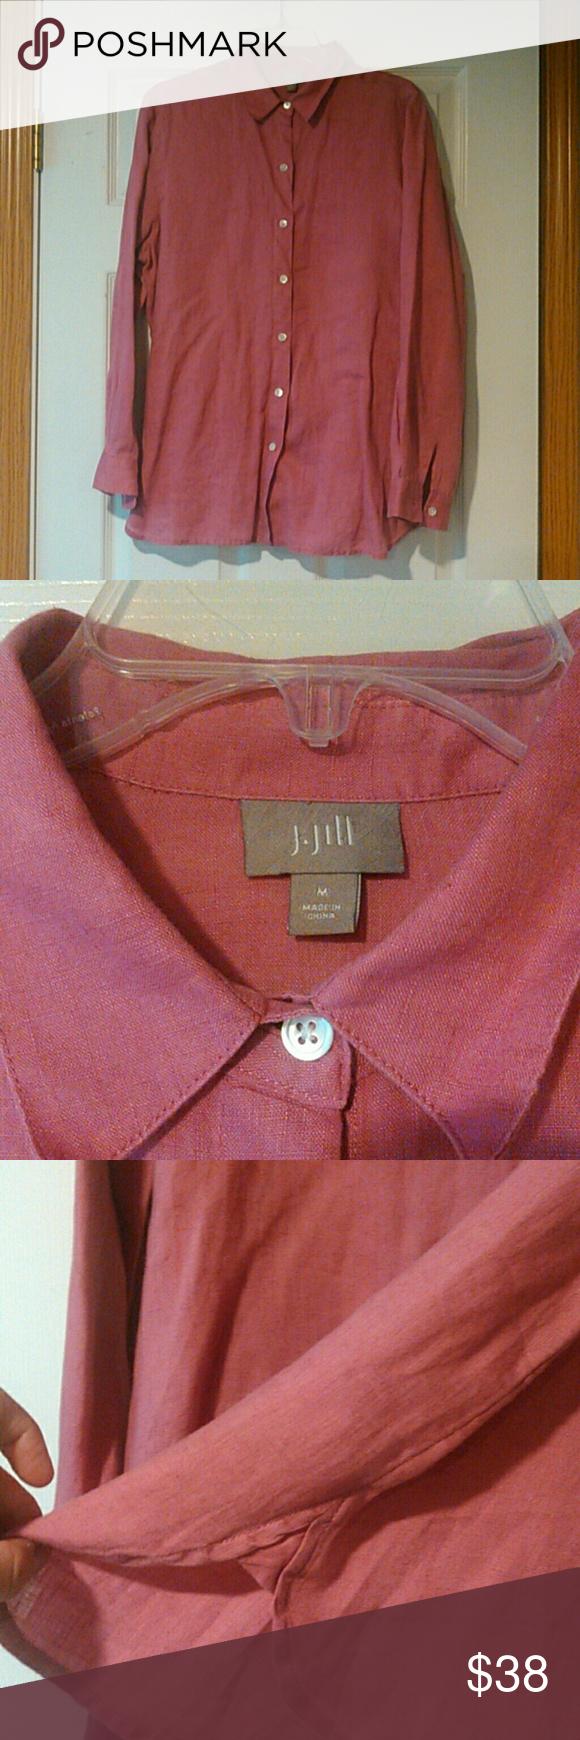 d9322f24 J. Jill Essential Linen Shirt Long sleeve. Front button closure. Shirttail  hemline. Machine washable. 100% woven linen. Excellent condition.